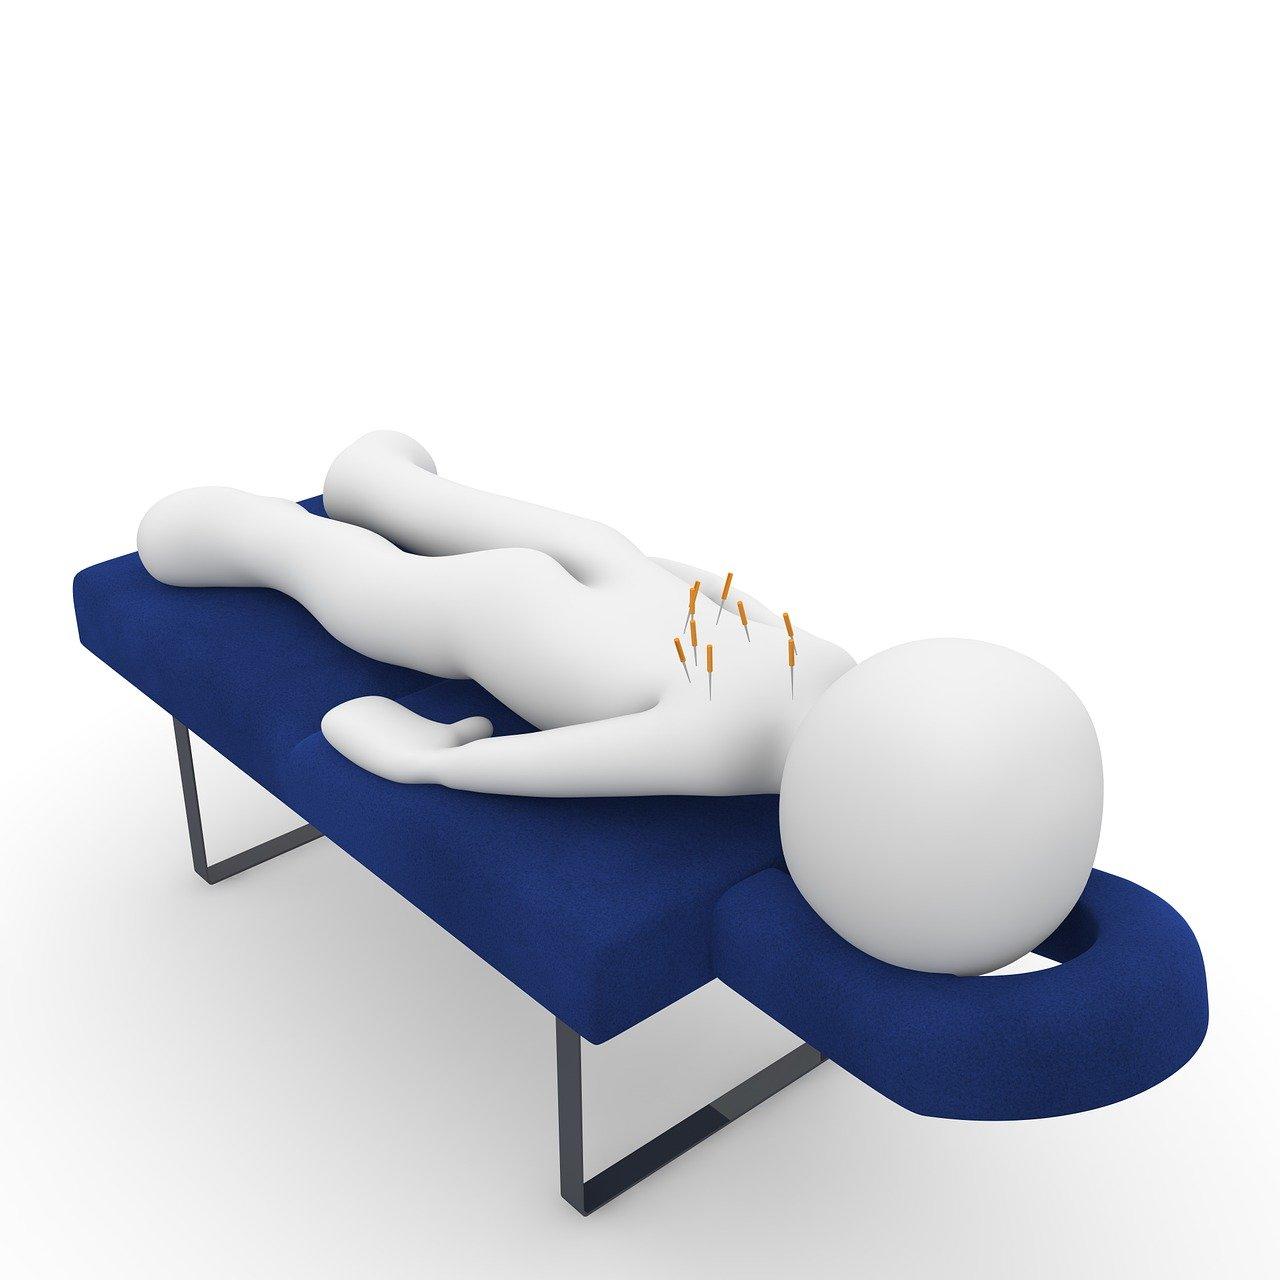 Fysiotherapie- oedeemtherapie Fennis fysiotherapeut opleiding